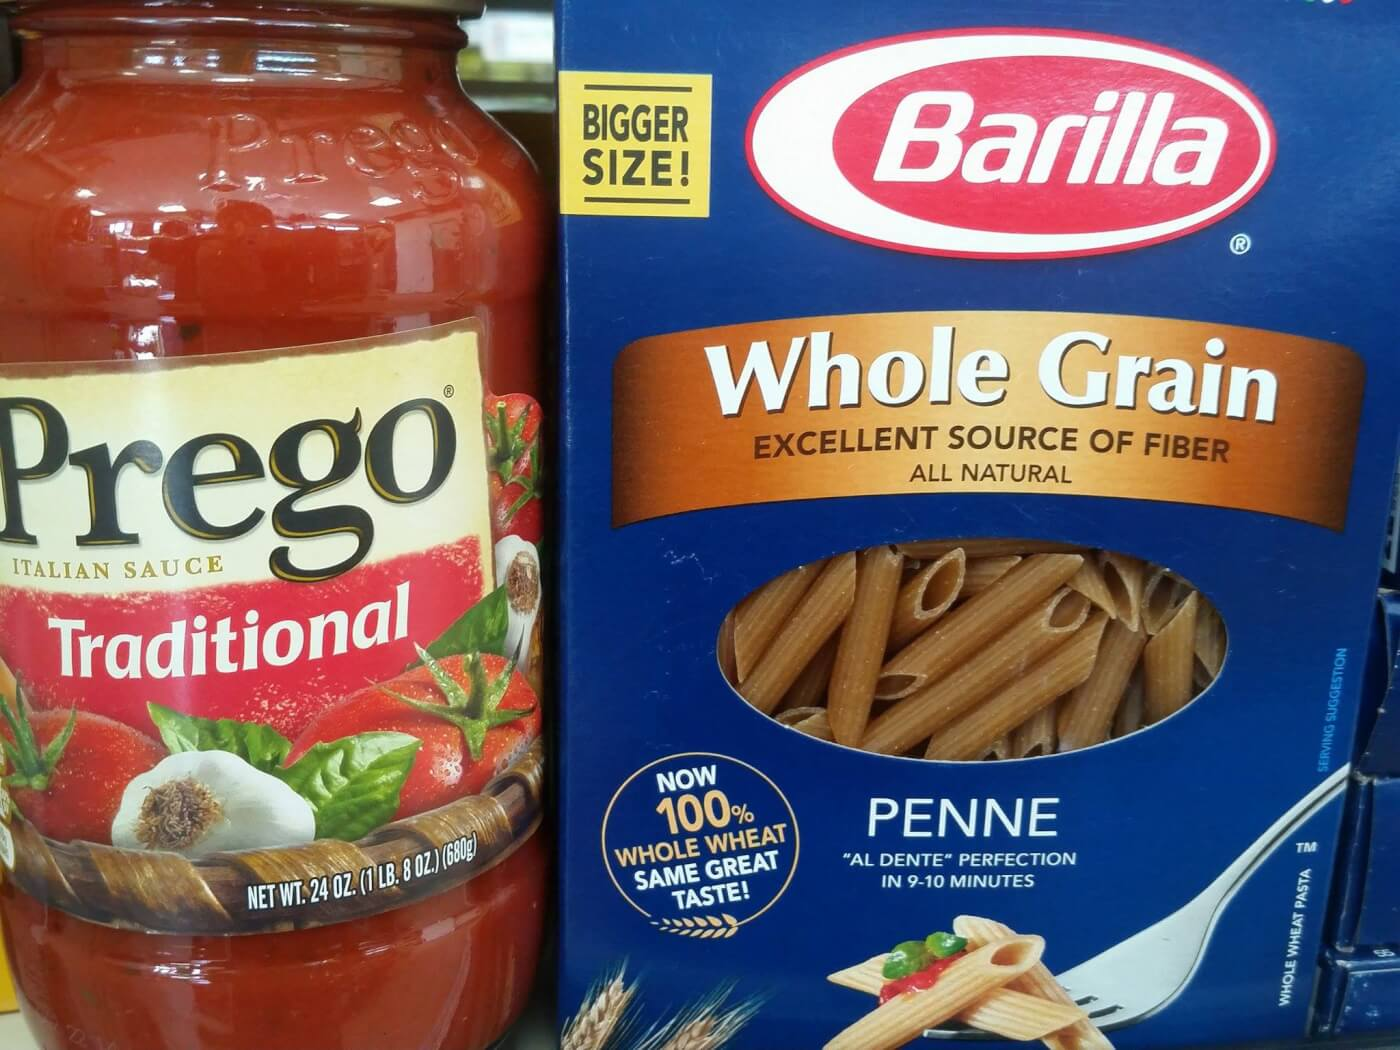 veganism talking to parents, talking to parents about going vegan, cheap vegan food, vegan on a budget, is pasta vegan